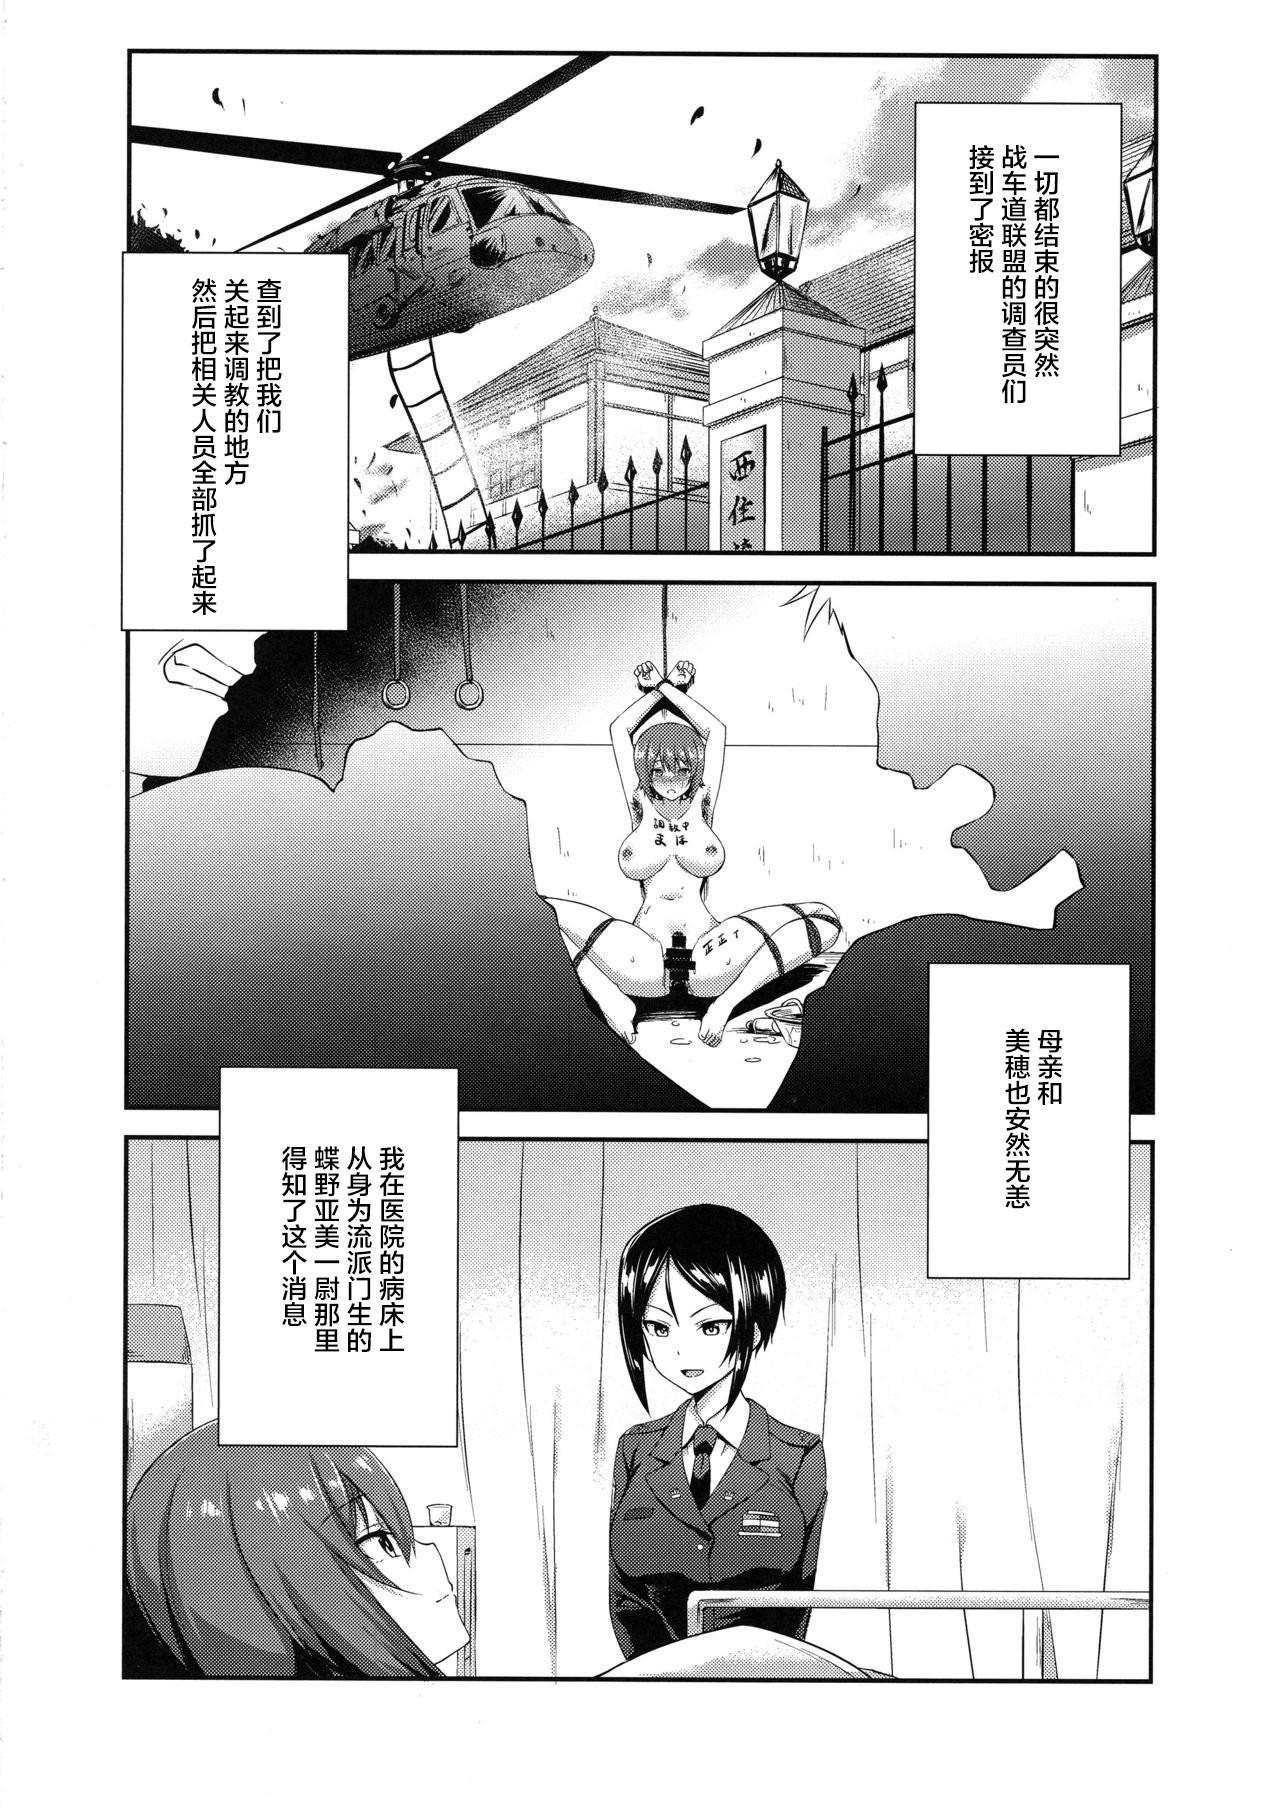 (C94) [chested (Tokupyon)] Nishizumi-ryuu Iemoto no Sodatekata - Maho no Baai Jou (Girls und Panzer) [Chinese] [不咕鸟汉化组] 5